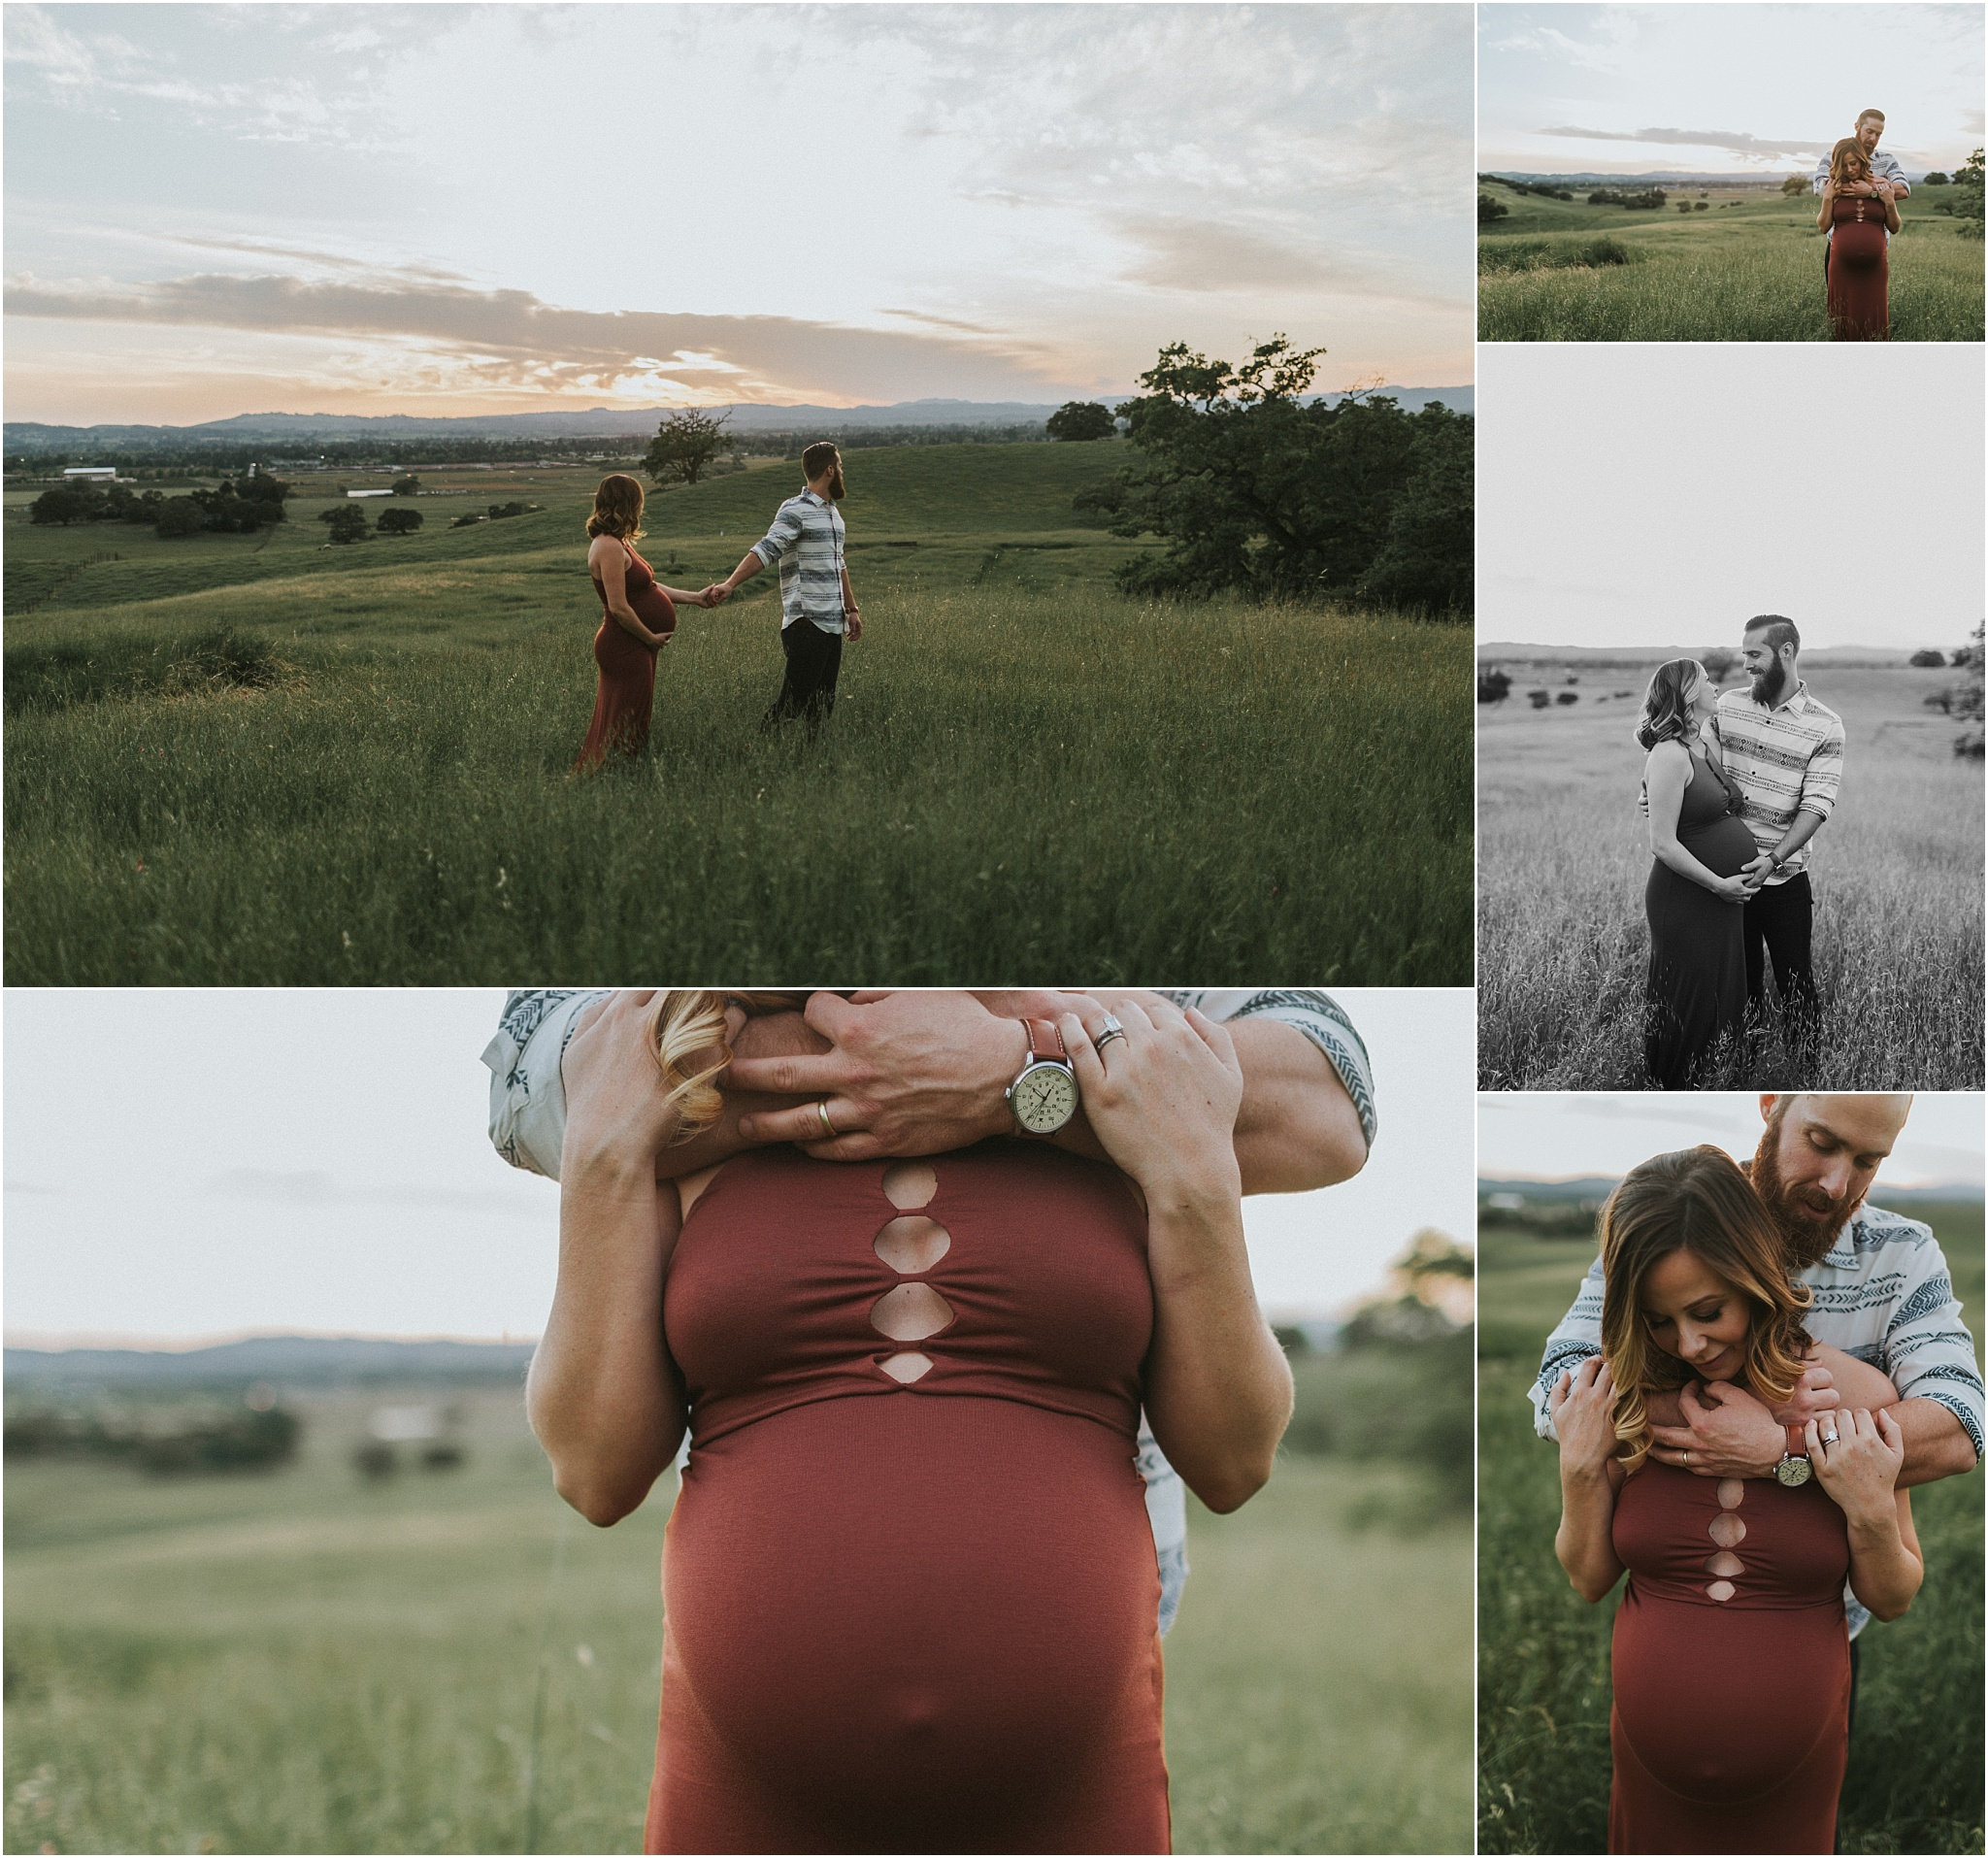 www.daniellenavratilphotography.com #maternityphotoshoot #maternityphotos #maternity #maternitysession #maternitypictures #pregnancy #maternity #sonomacountyphotographer #sonomacounty  #maternityphotos #maternityphotoshoot #maternitypictures #maternitysession